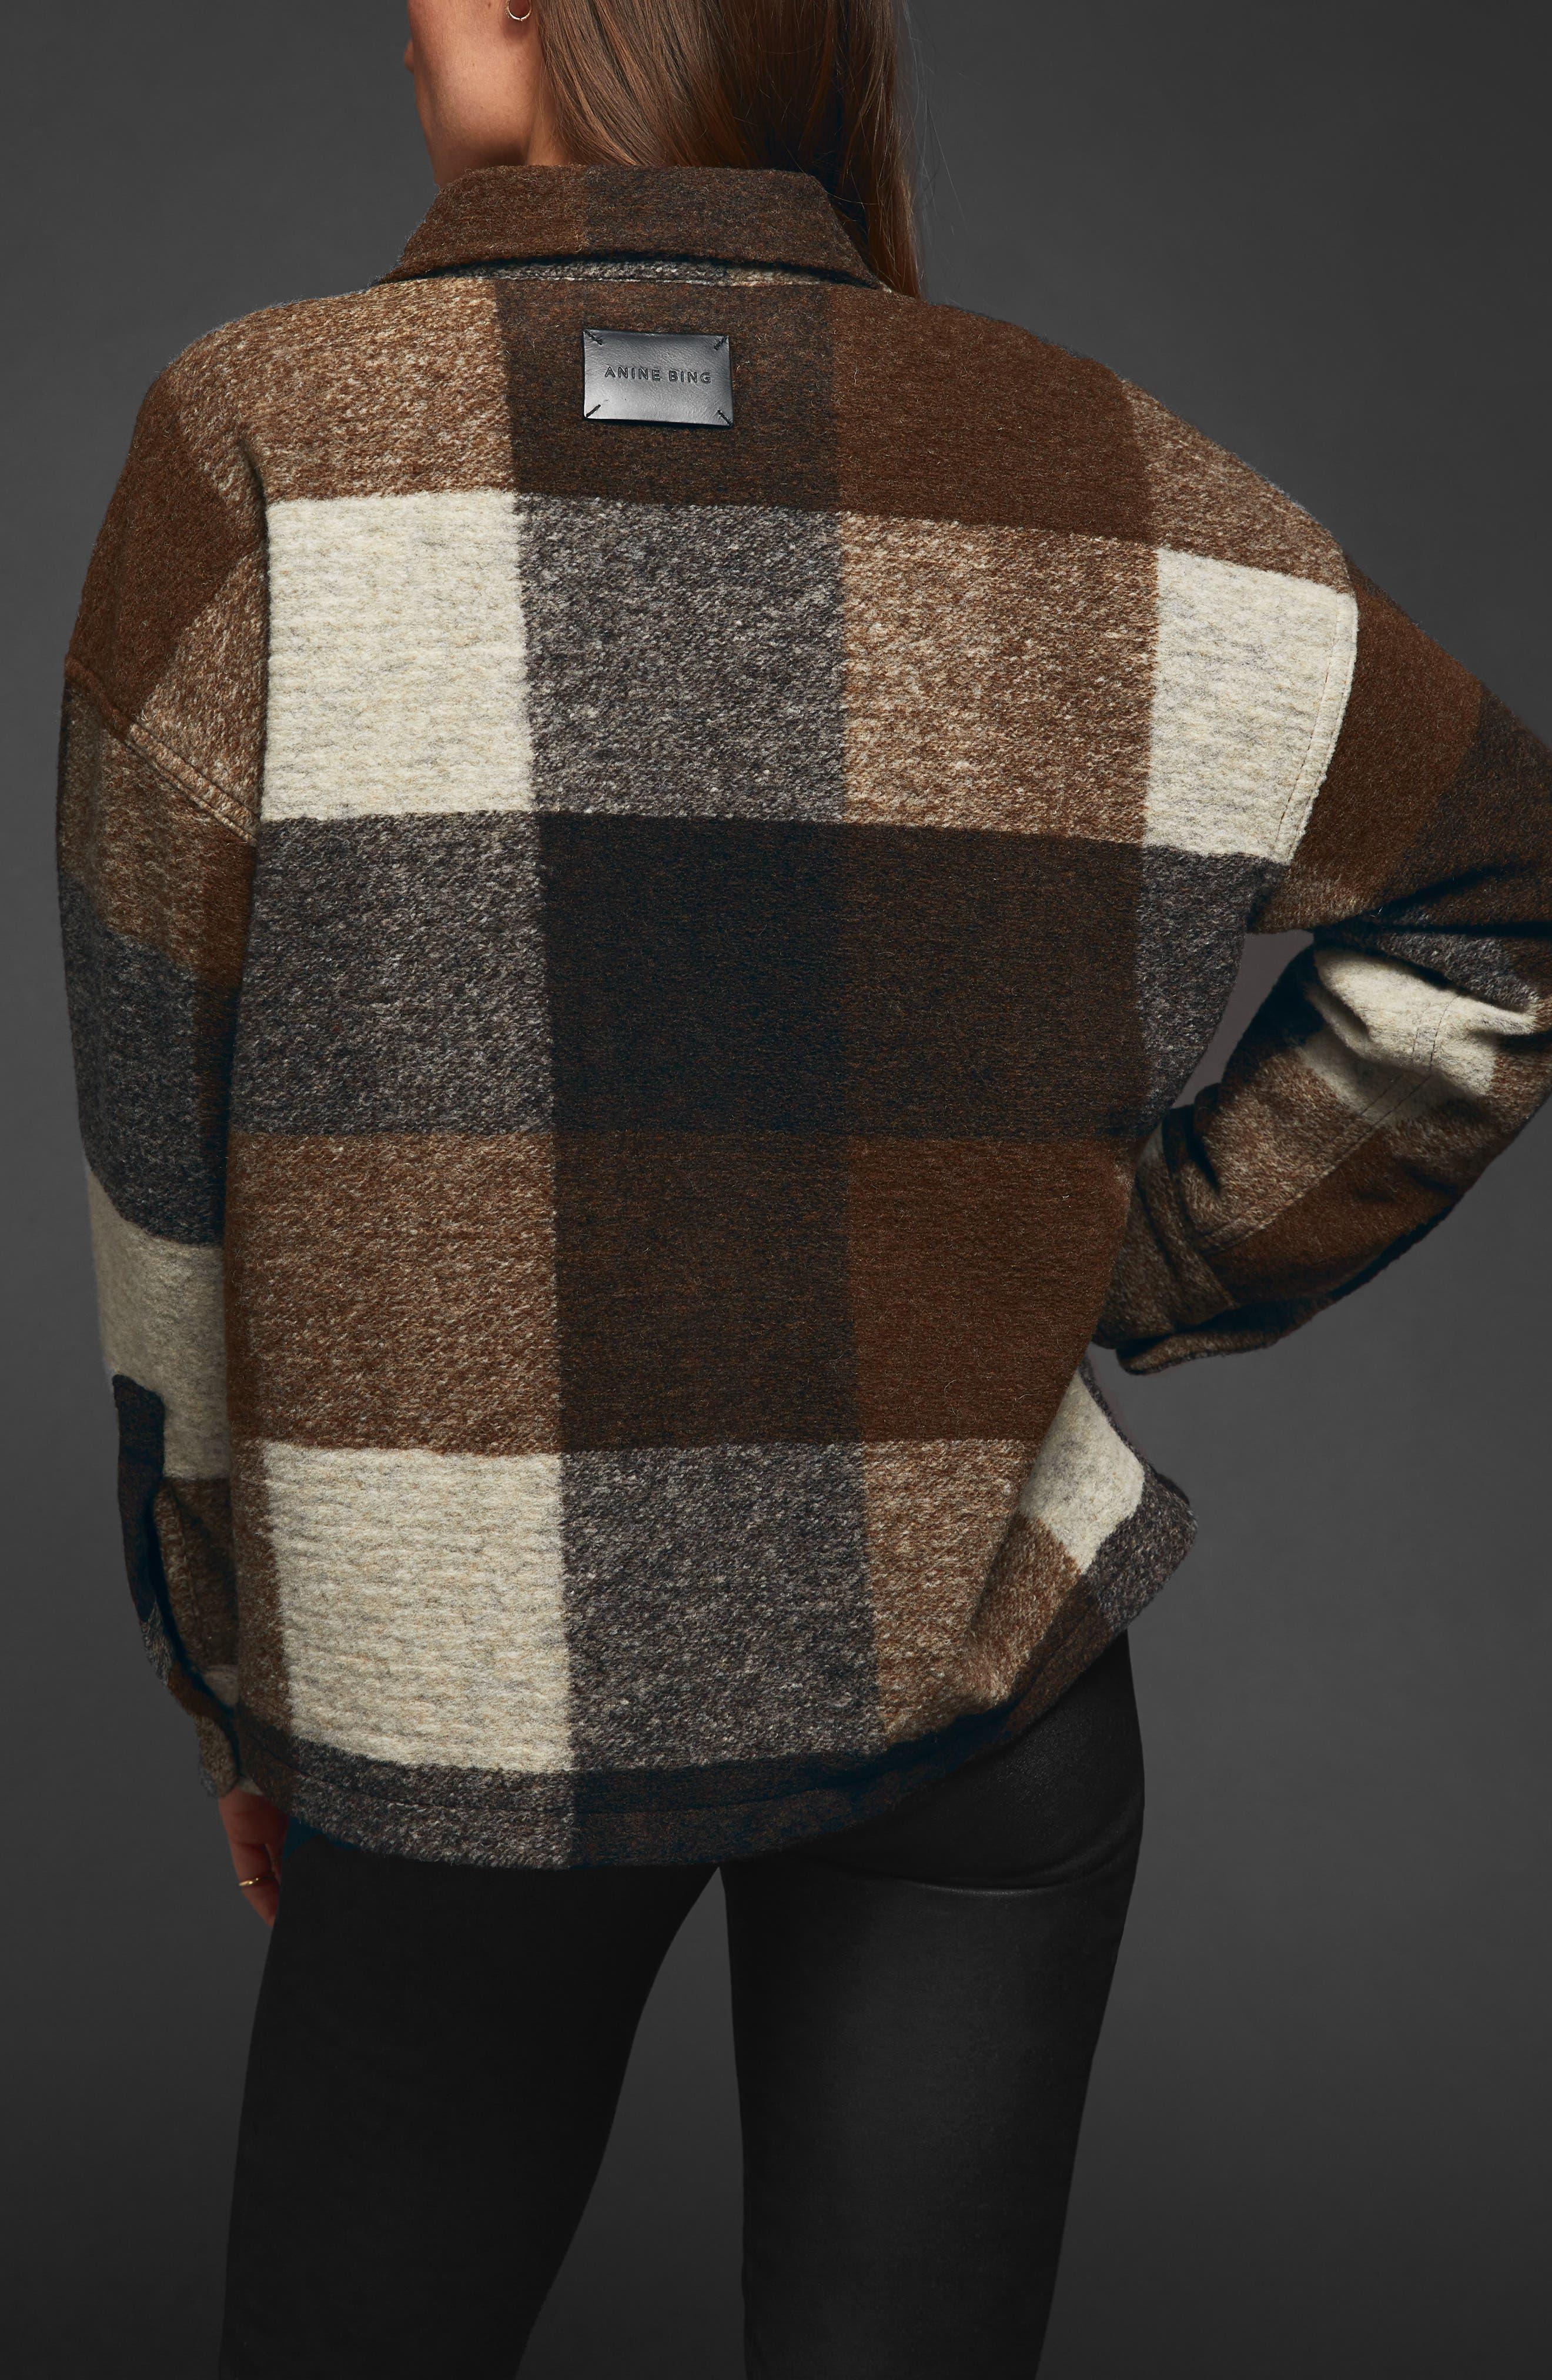 Bobbi Flannel Shirt Jacket,                             Alternate thumbnail 2, color,                             BROWN